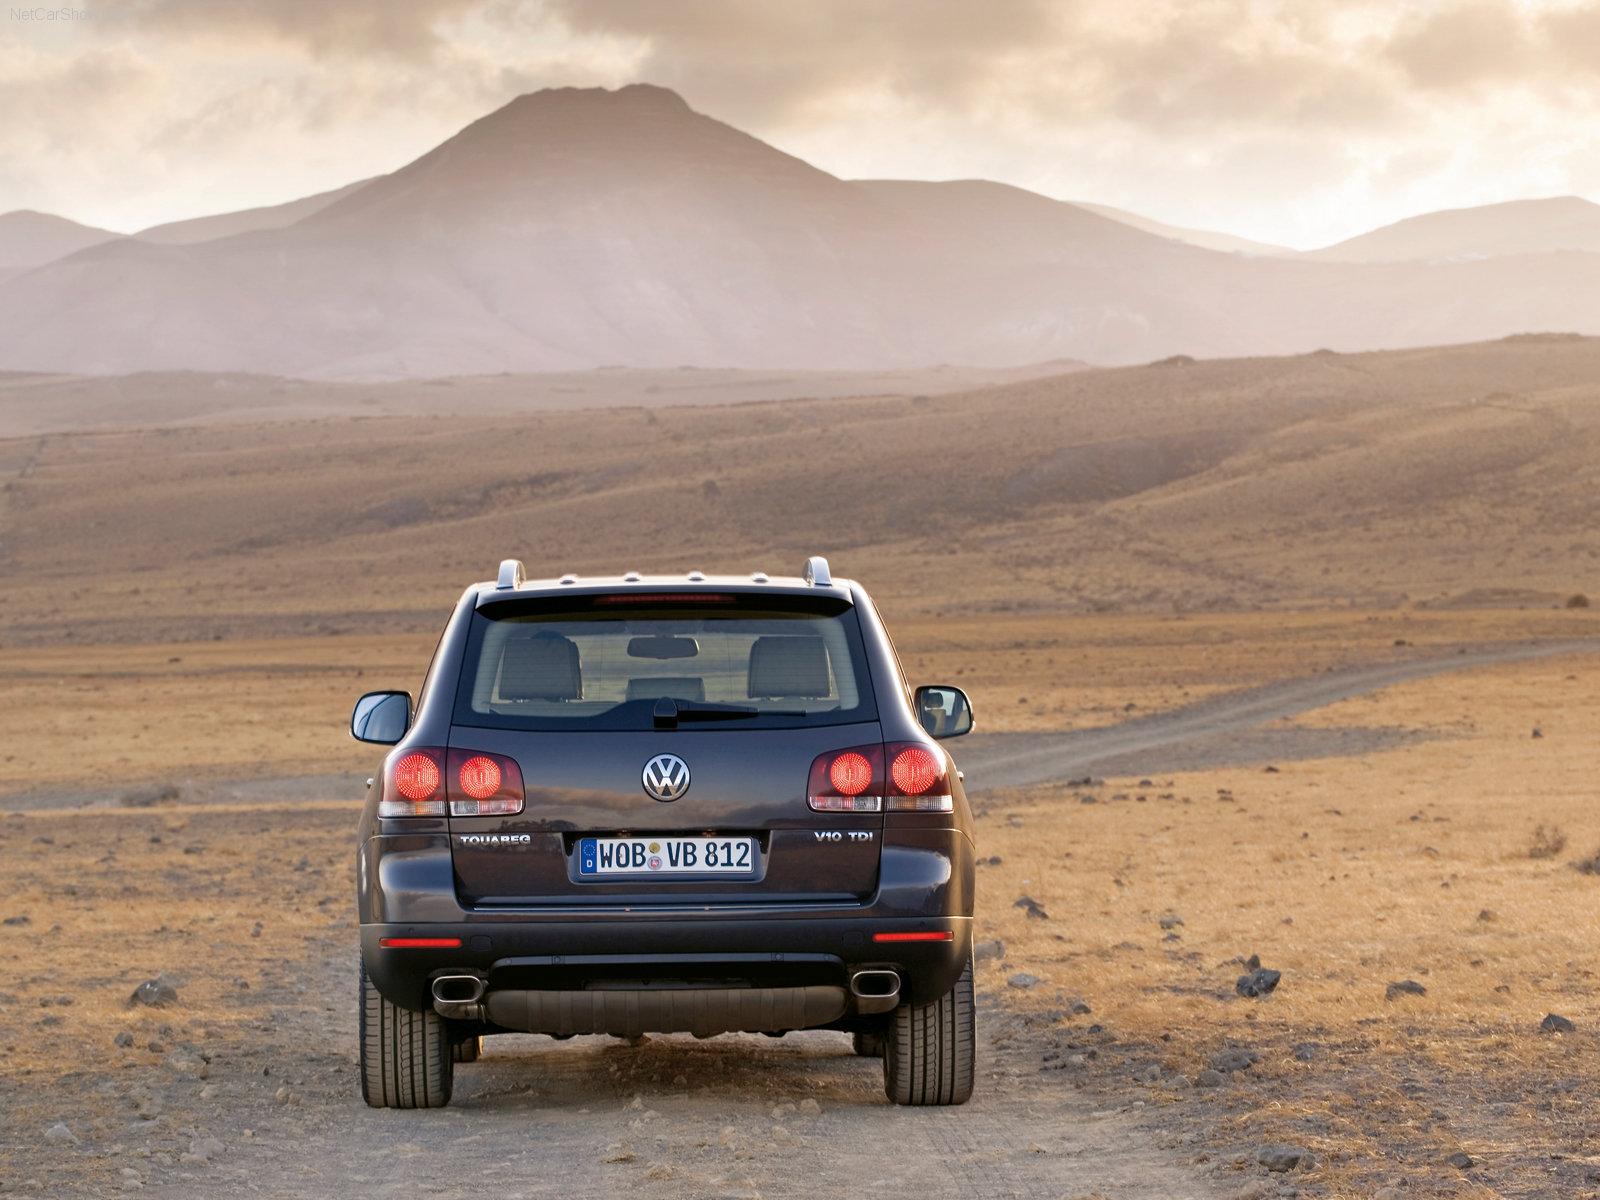 http://w04.ru/foto/Volkswagen-Touareg_2007_1600x1200_wallpaper_1e.jpg